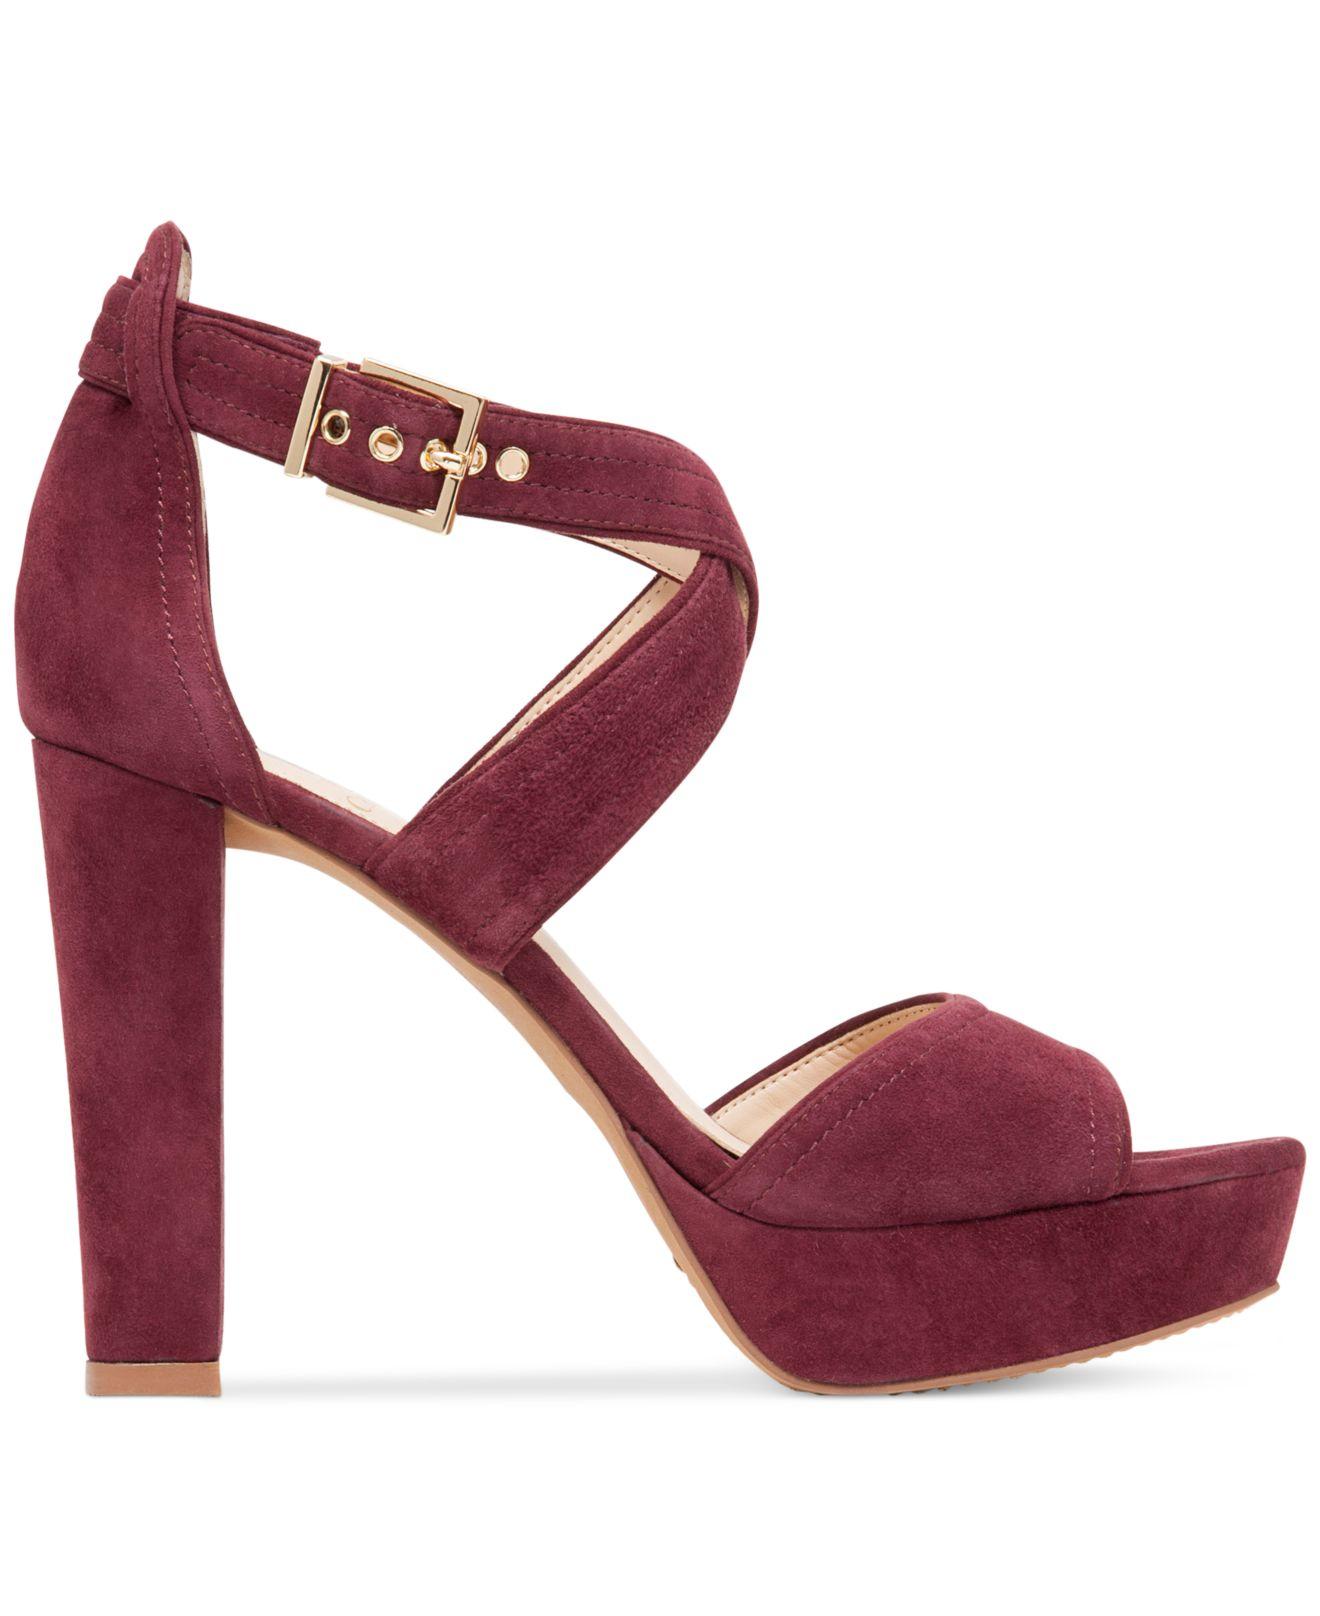 vince camuto shayla platform sandals in purple